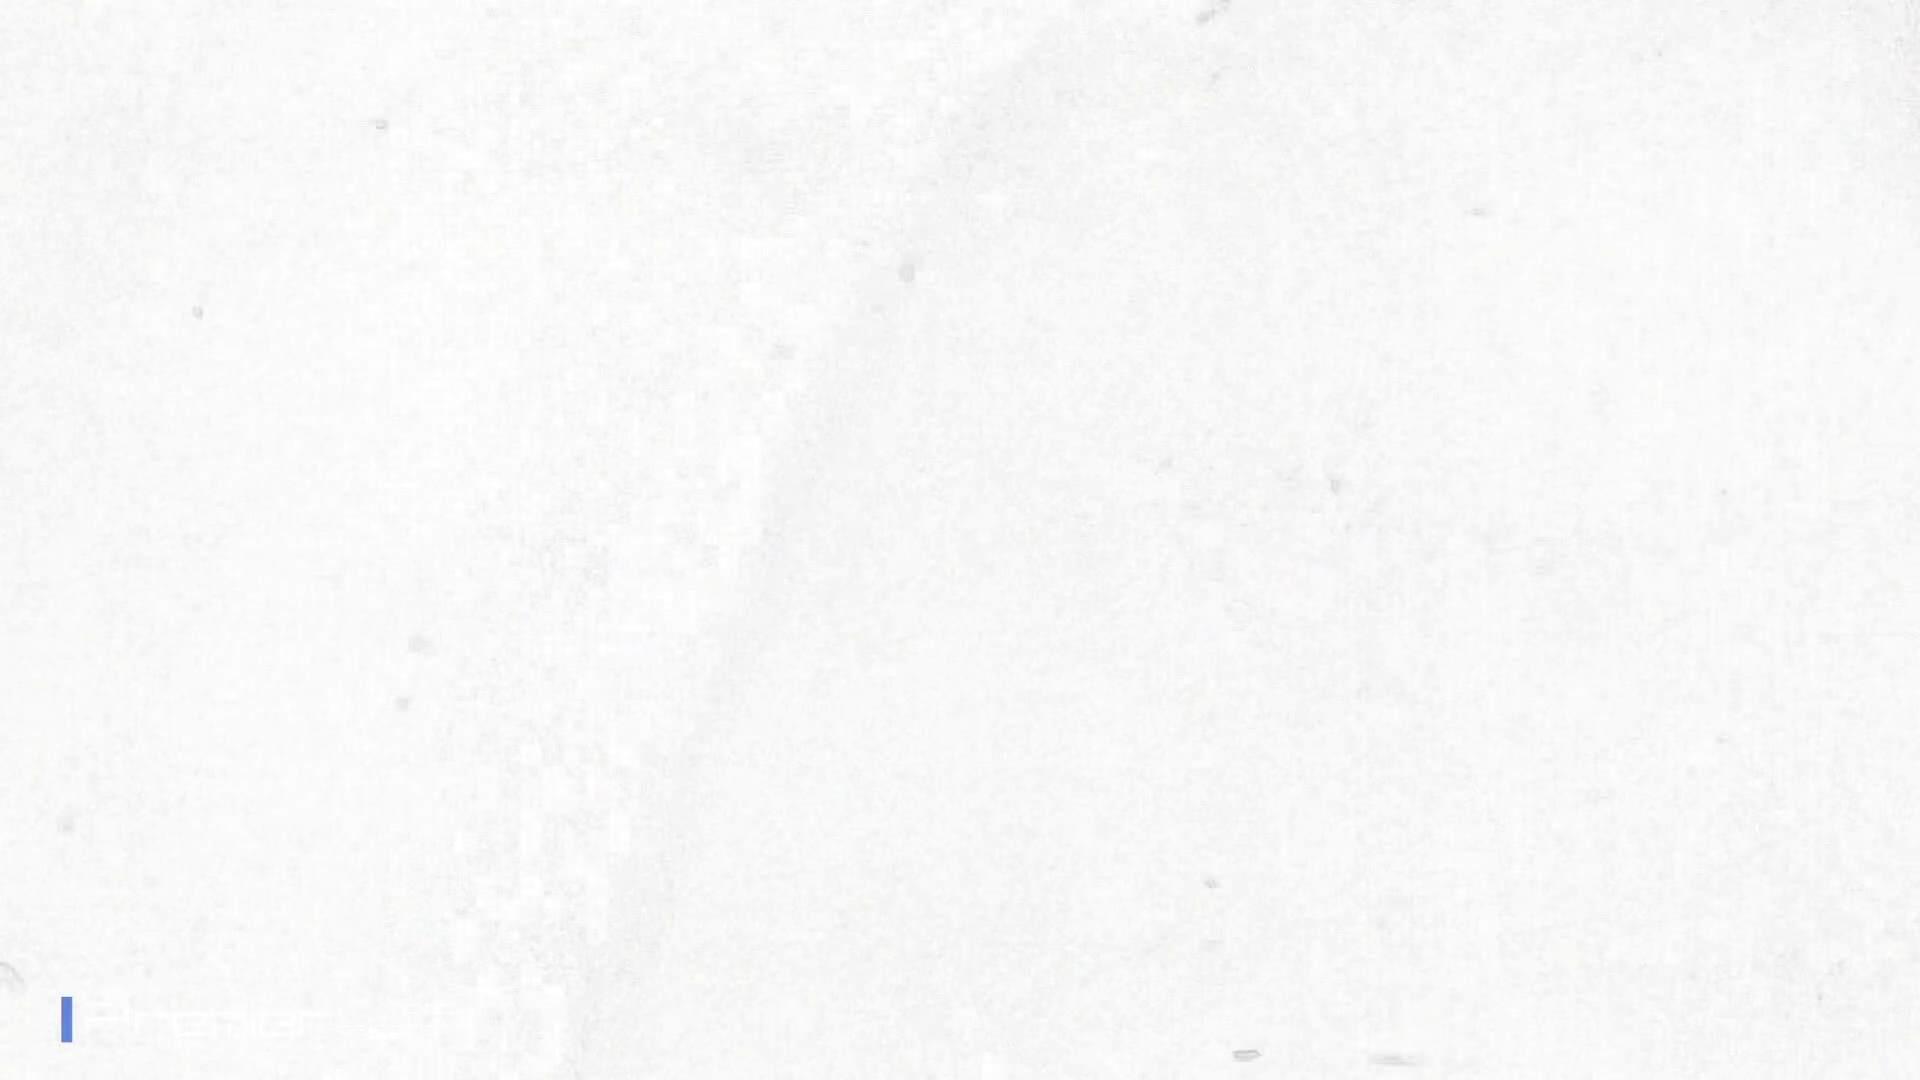 ▲2017_03位▲ 復讐のトイレ盗撮 Vol.01 高評価 SEX無修正画像 70画像 69